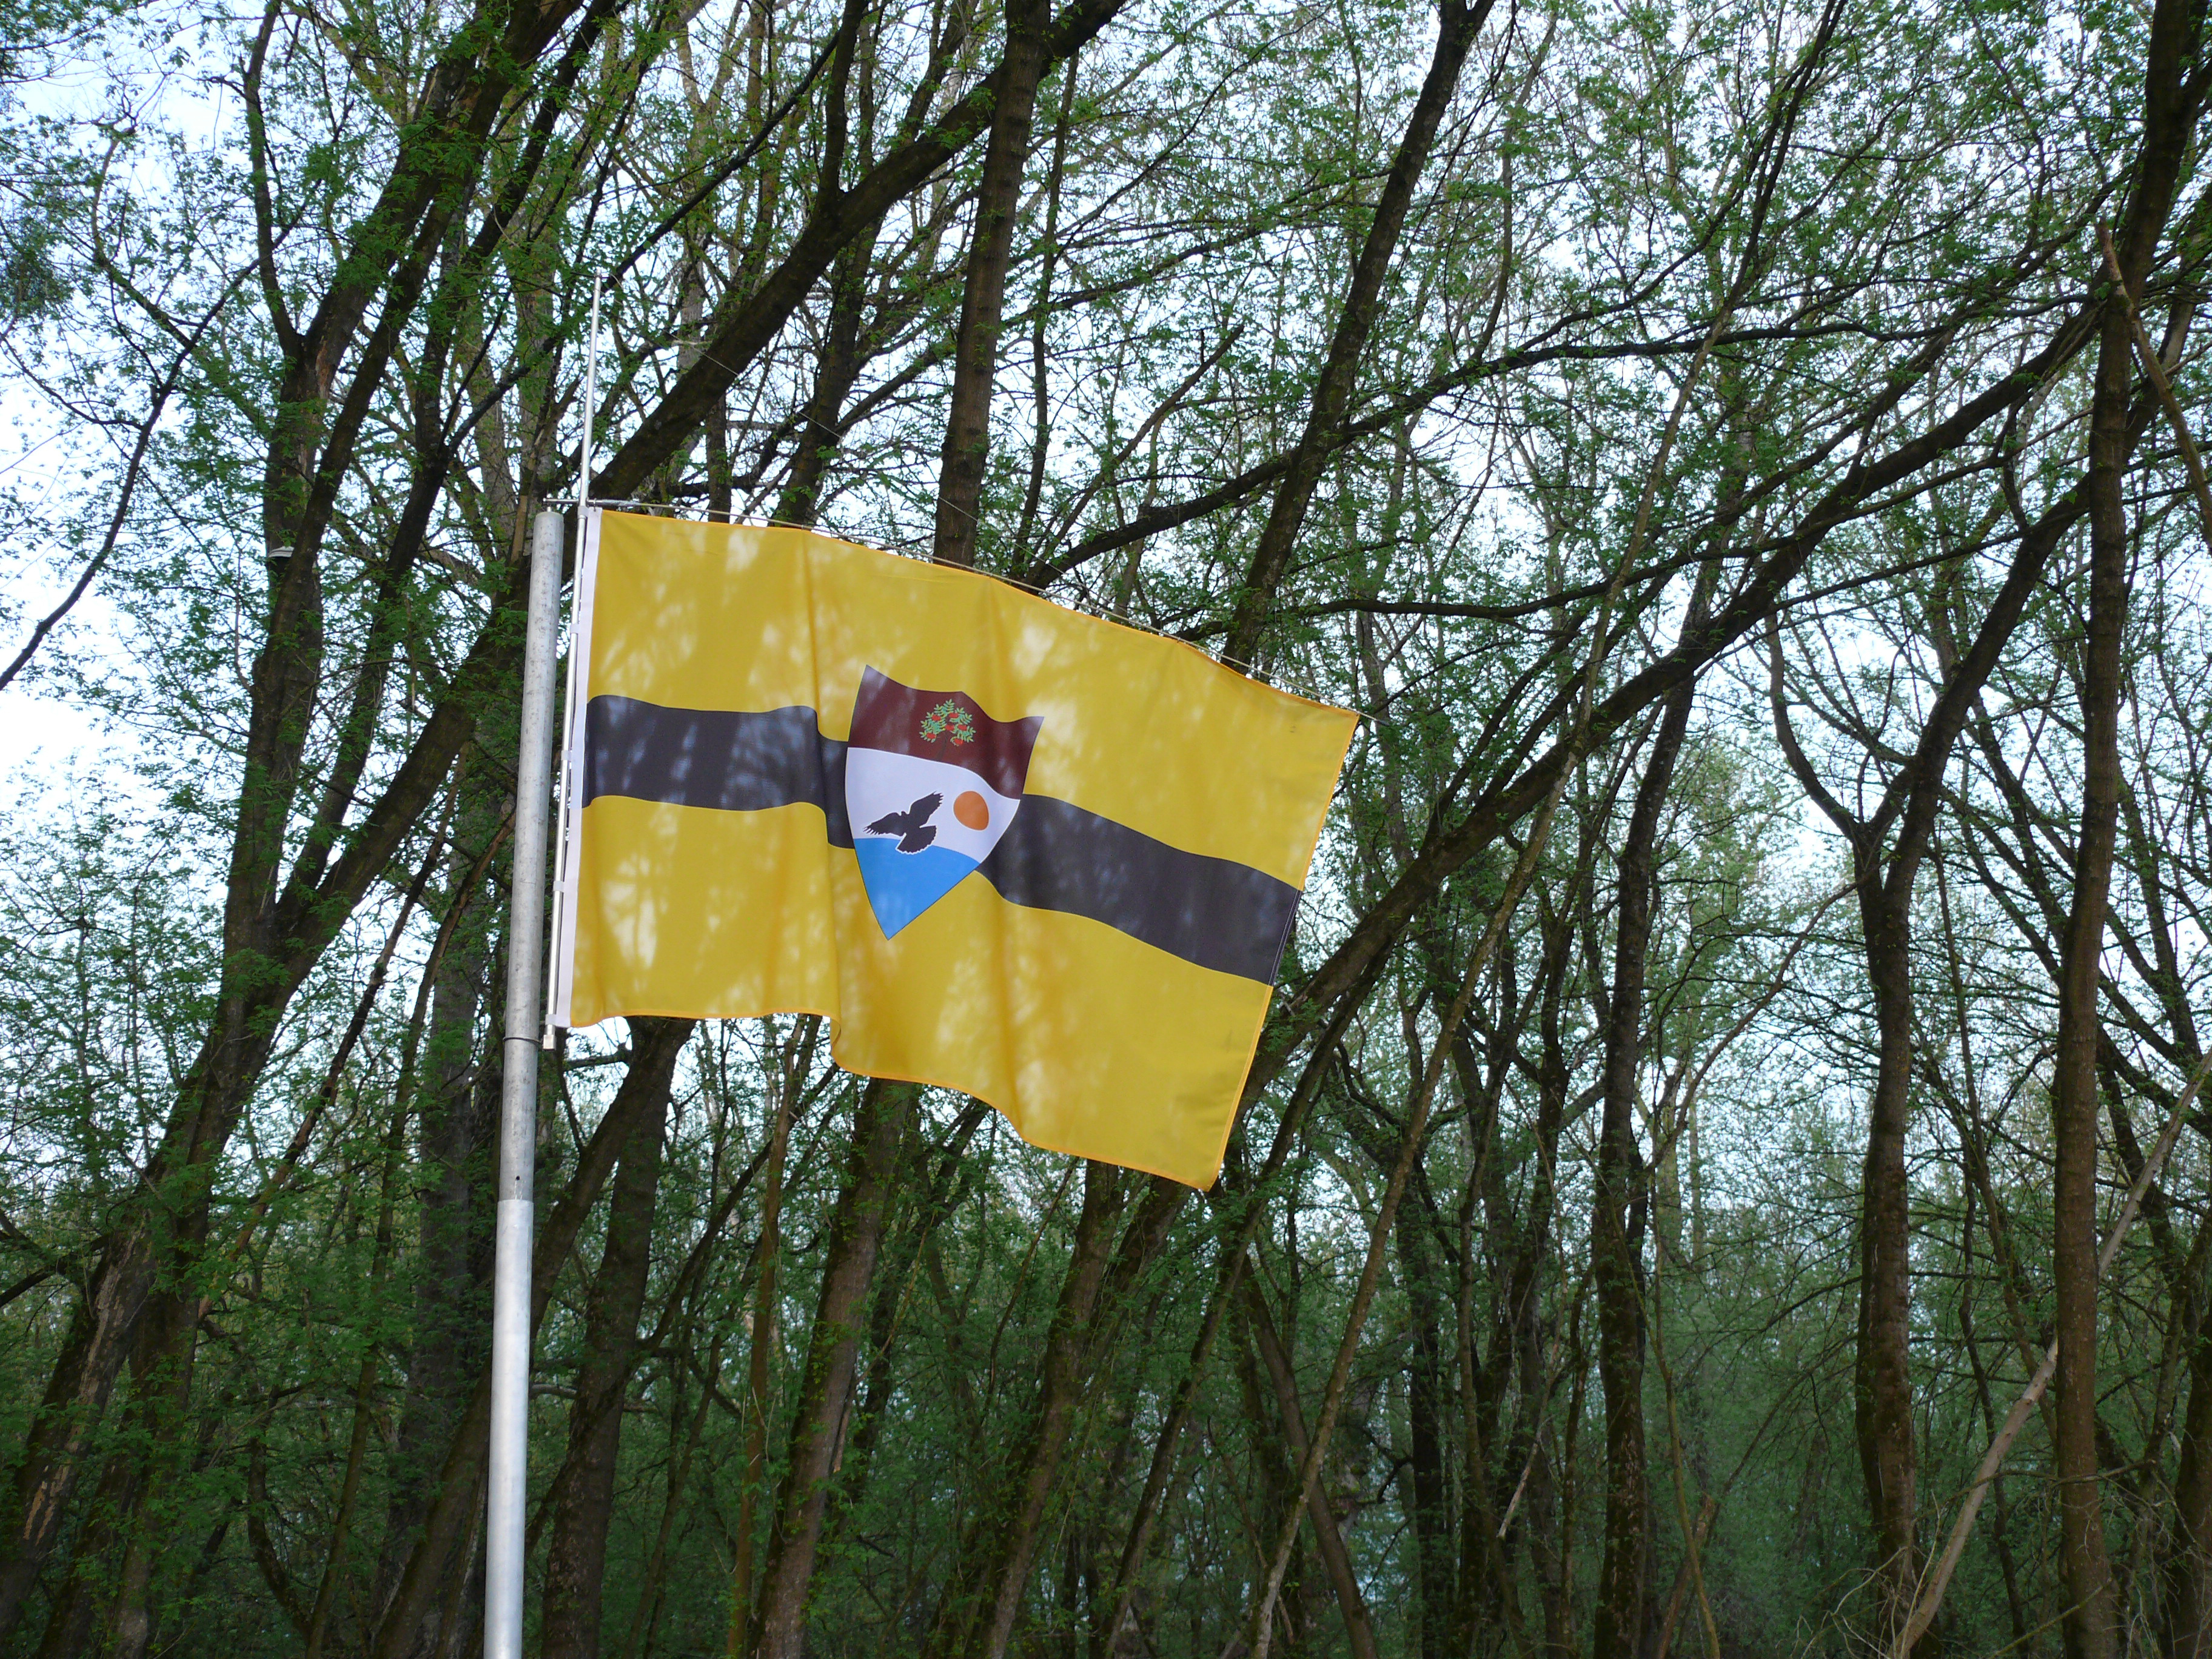 The flag of Liberland.